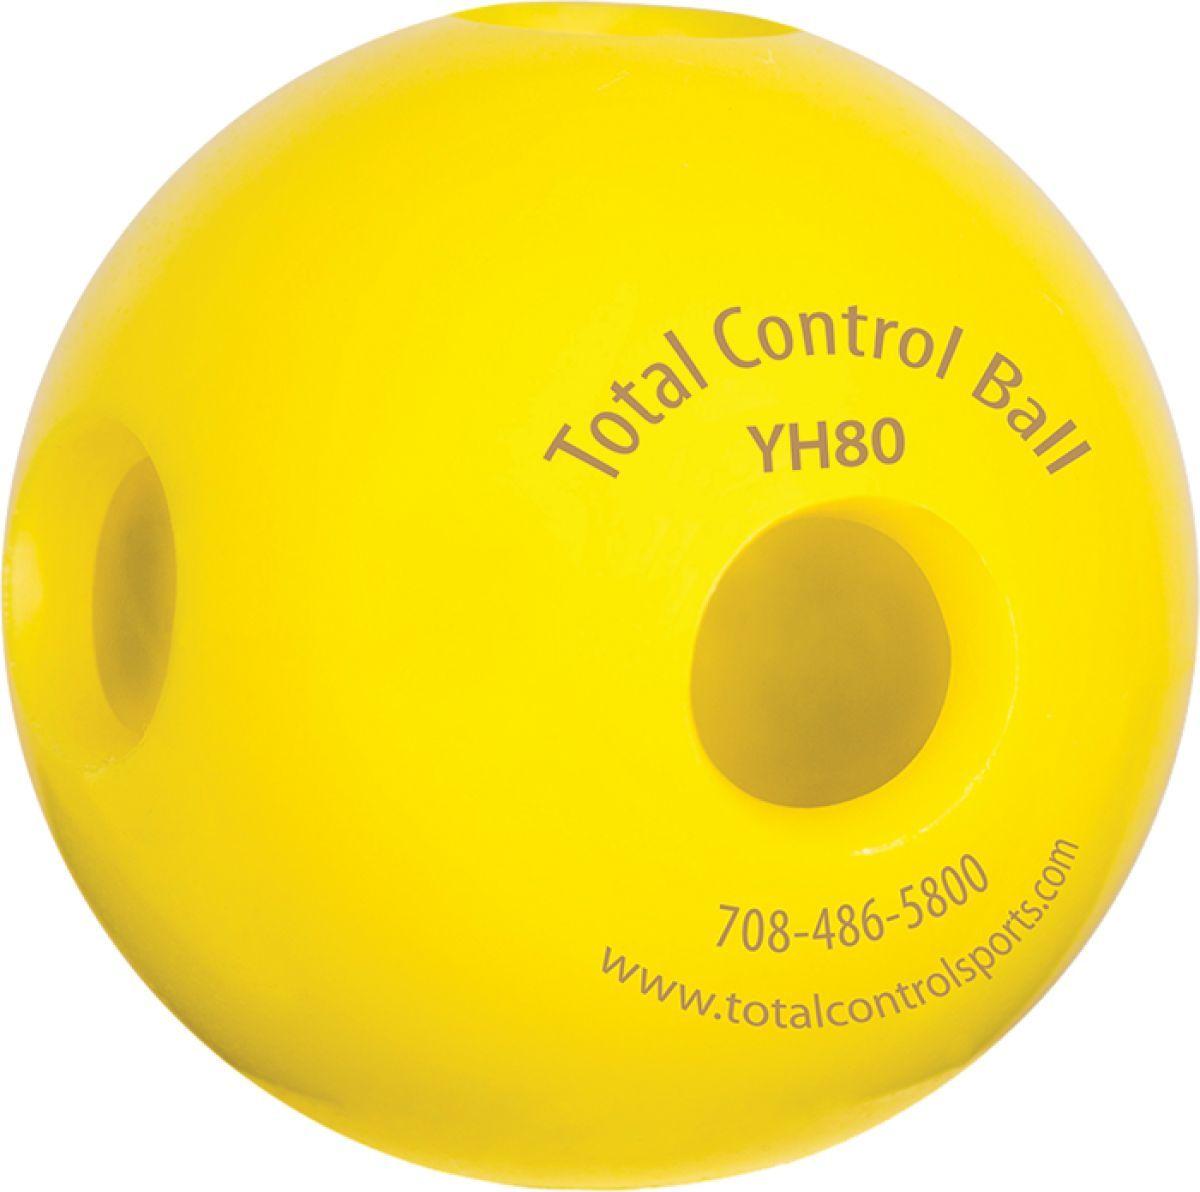 Total Control 3.2